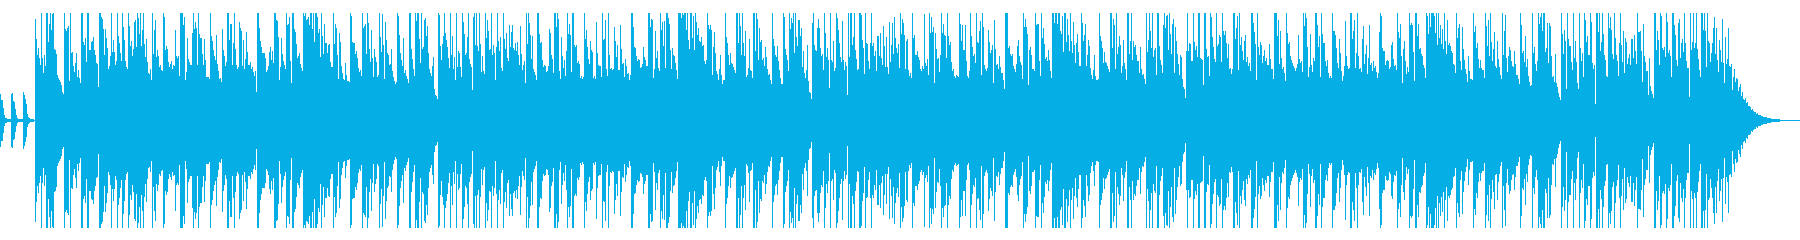 CMや動画にハードロックなベース&ドラムの再生済みの波形